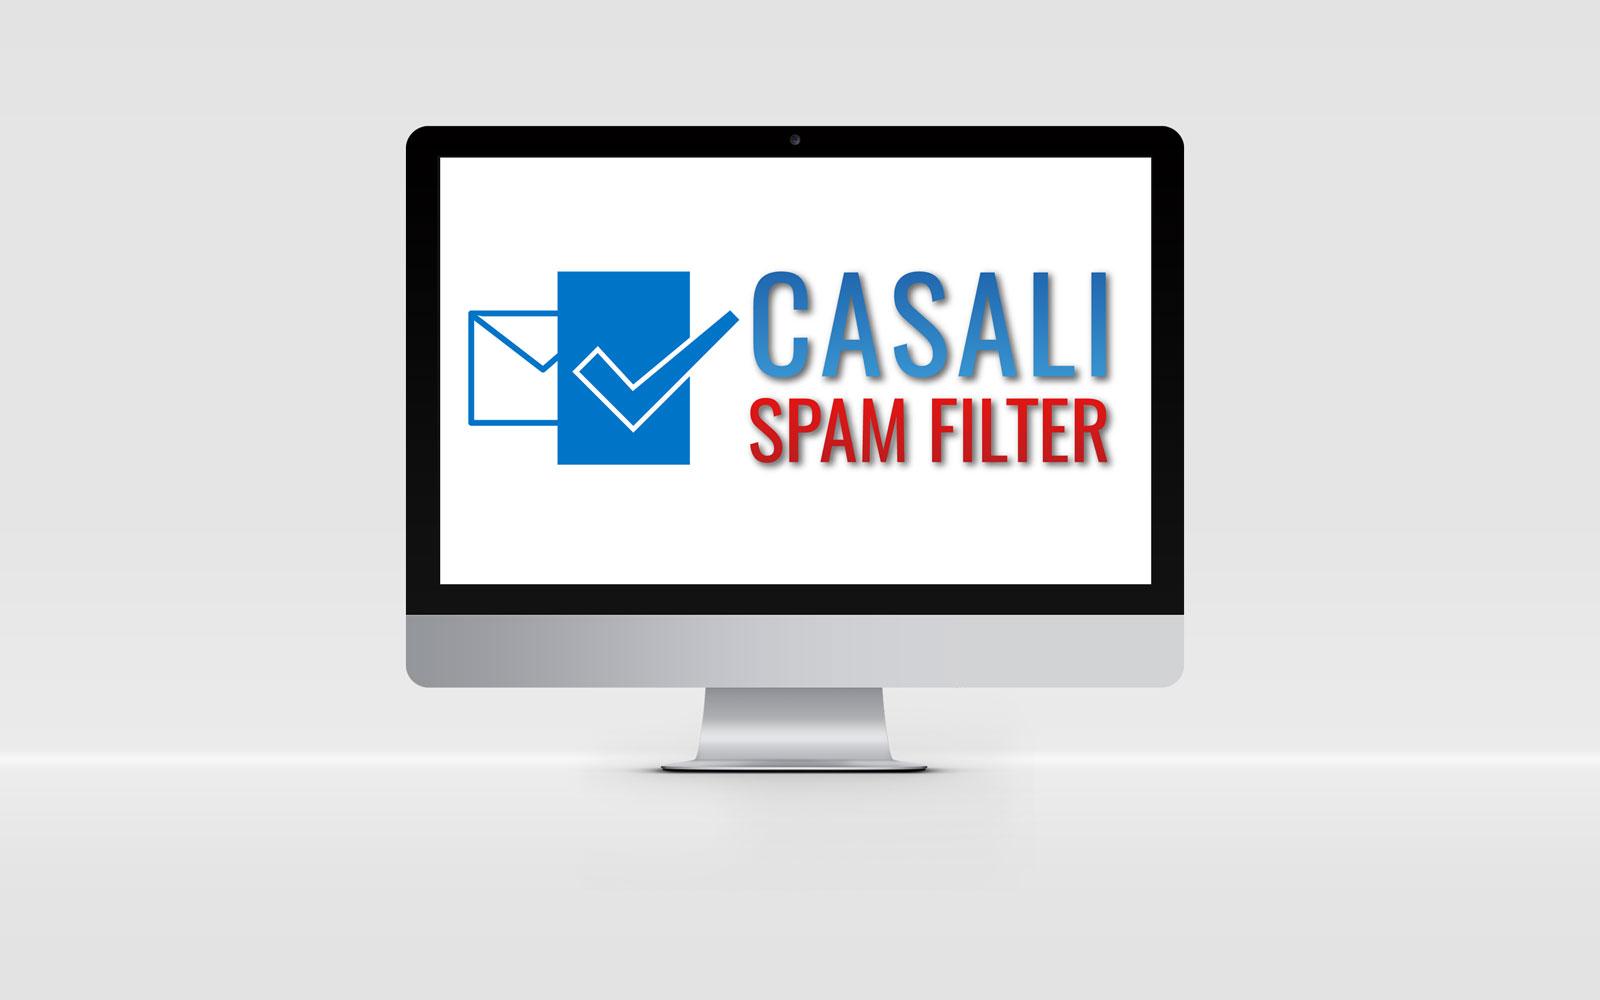 Casali Spam Filters